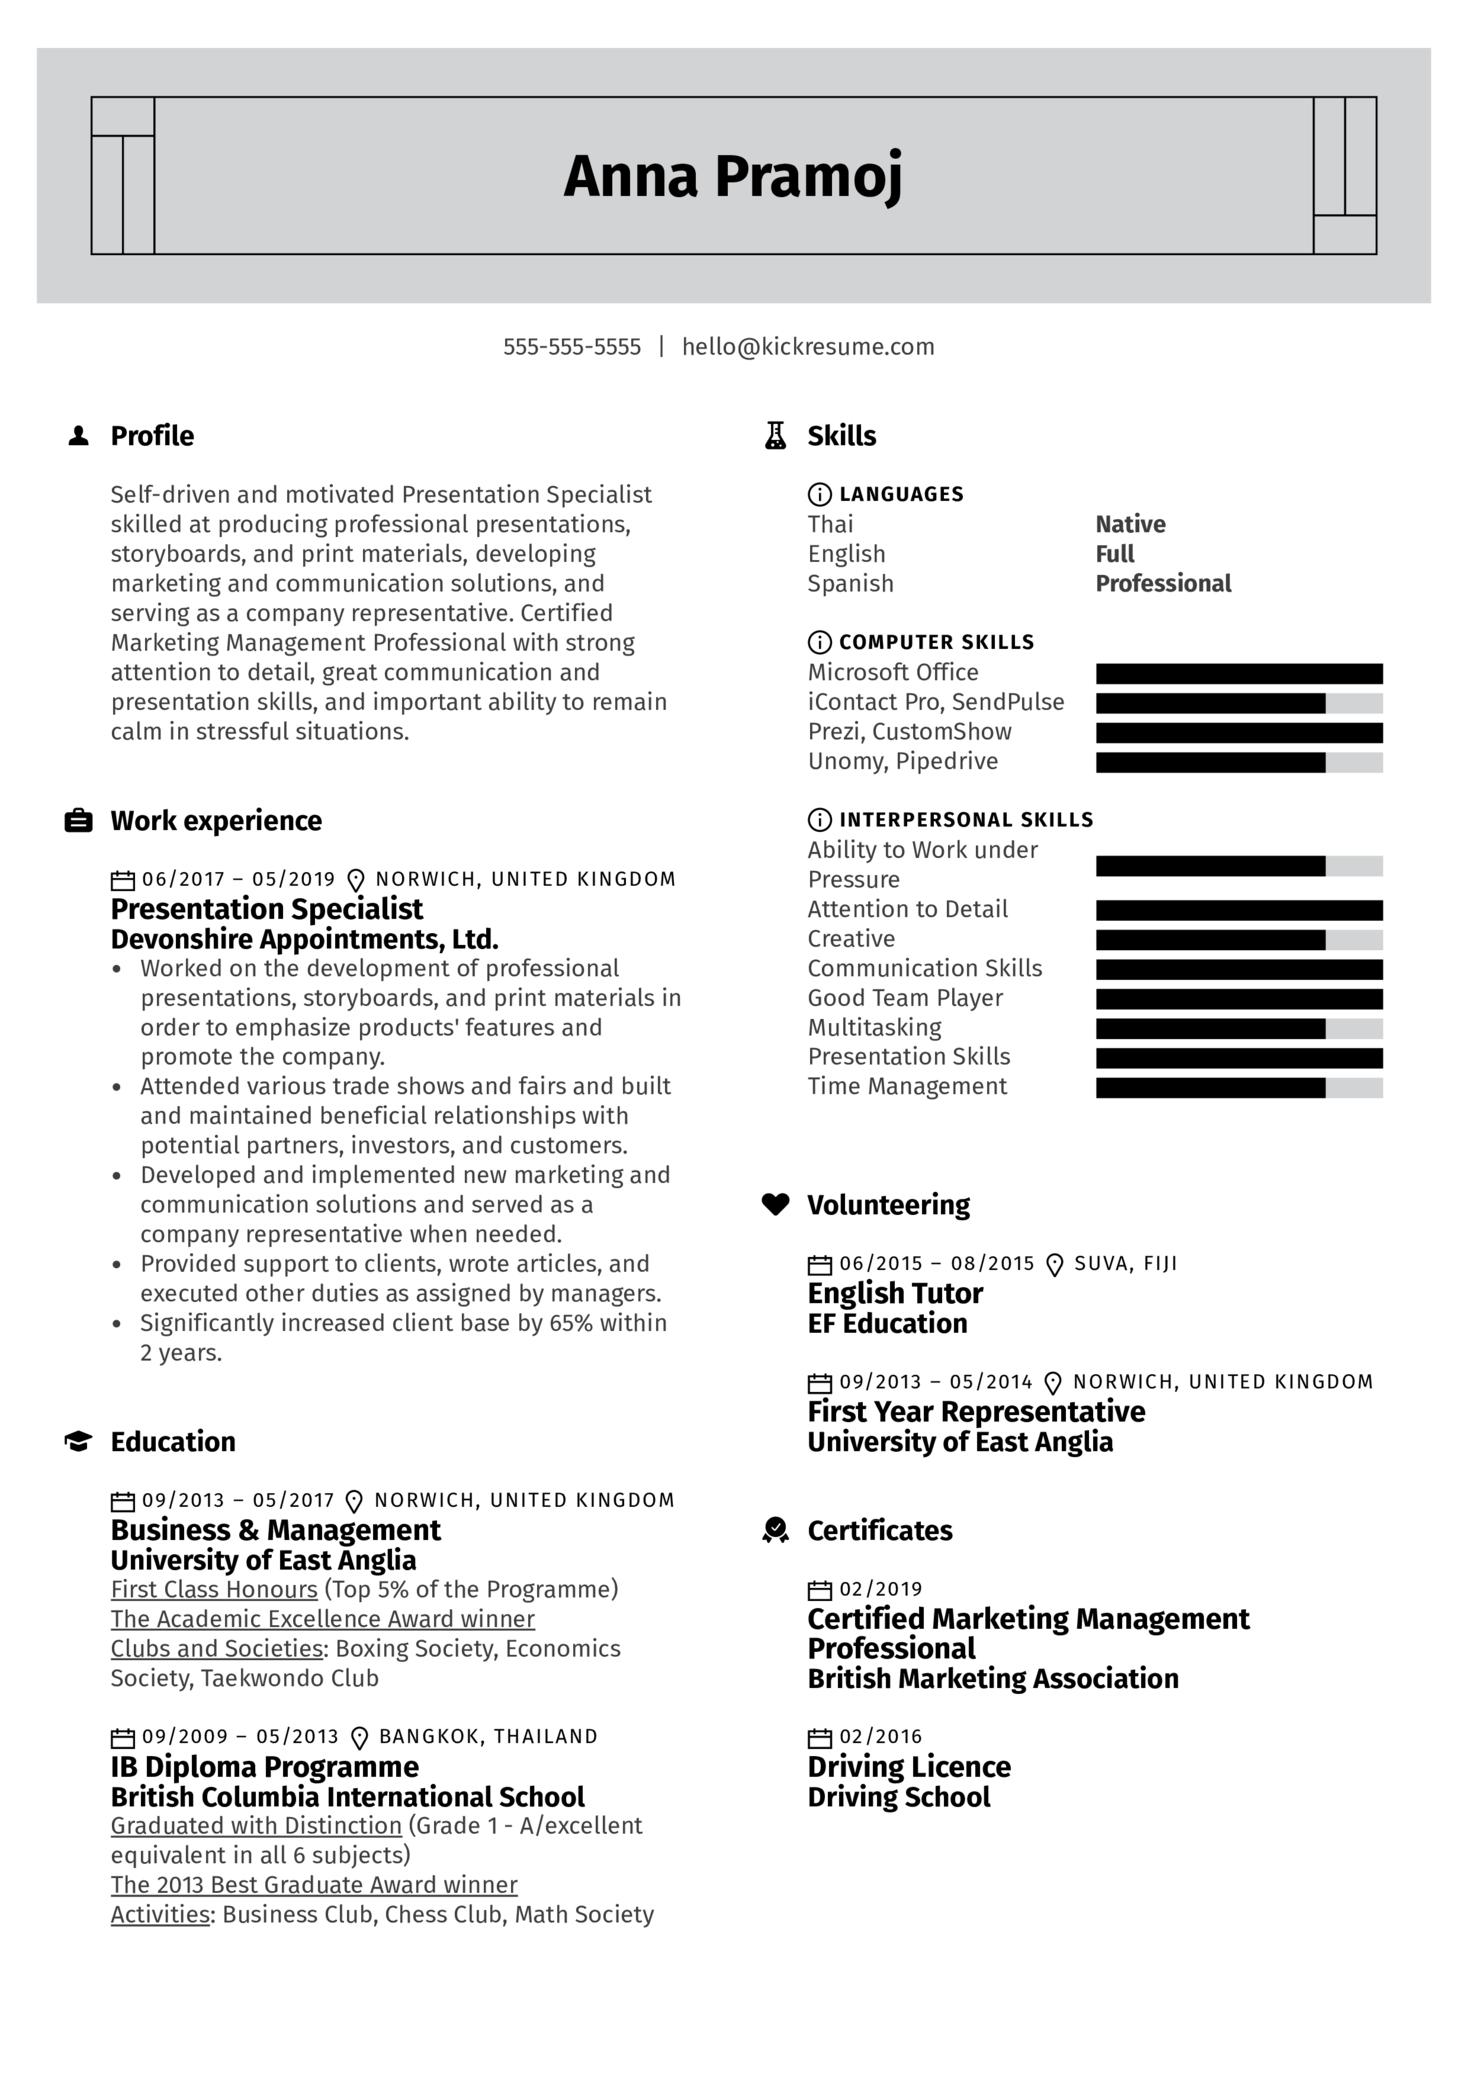 Presentation Specialist Resume Example (Part 1)